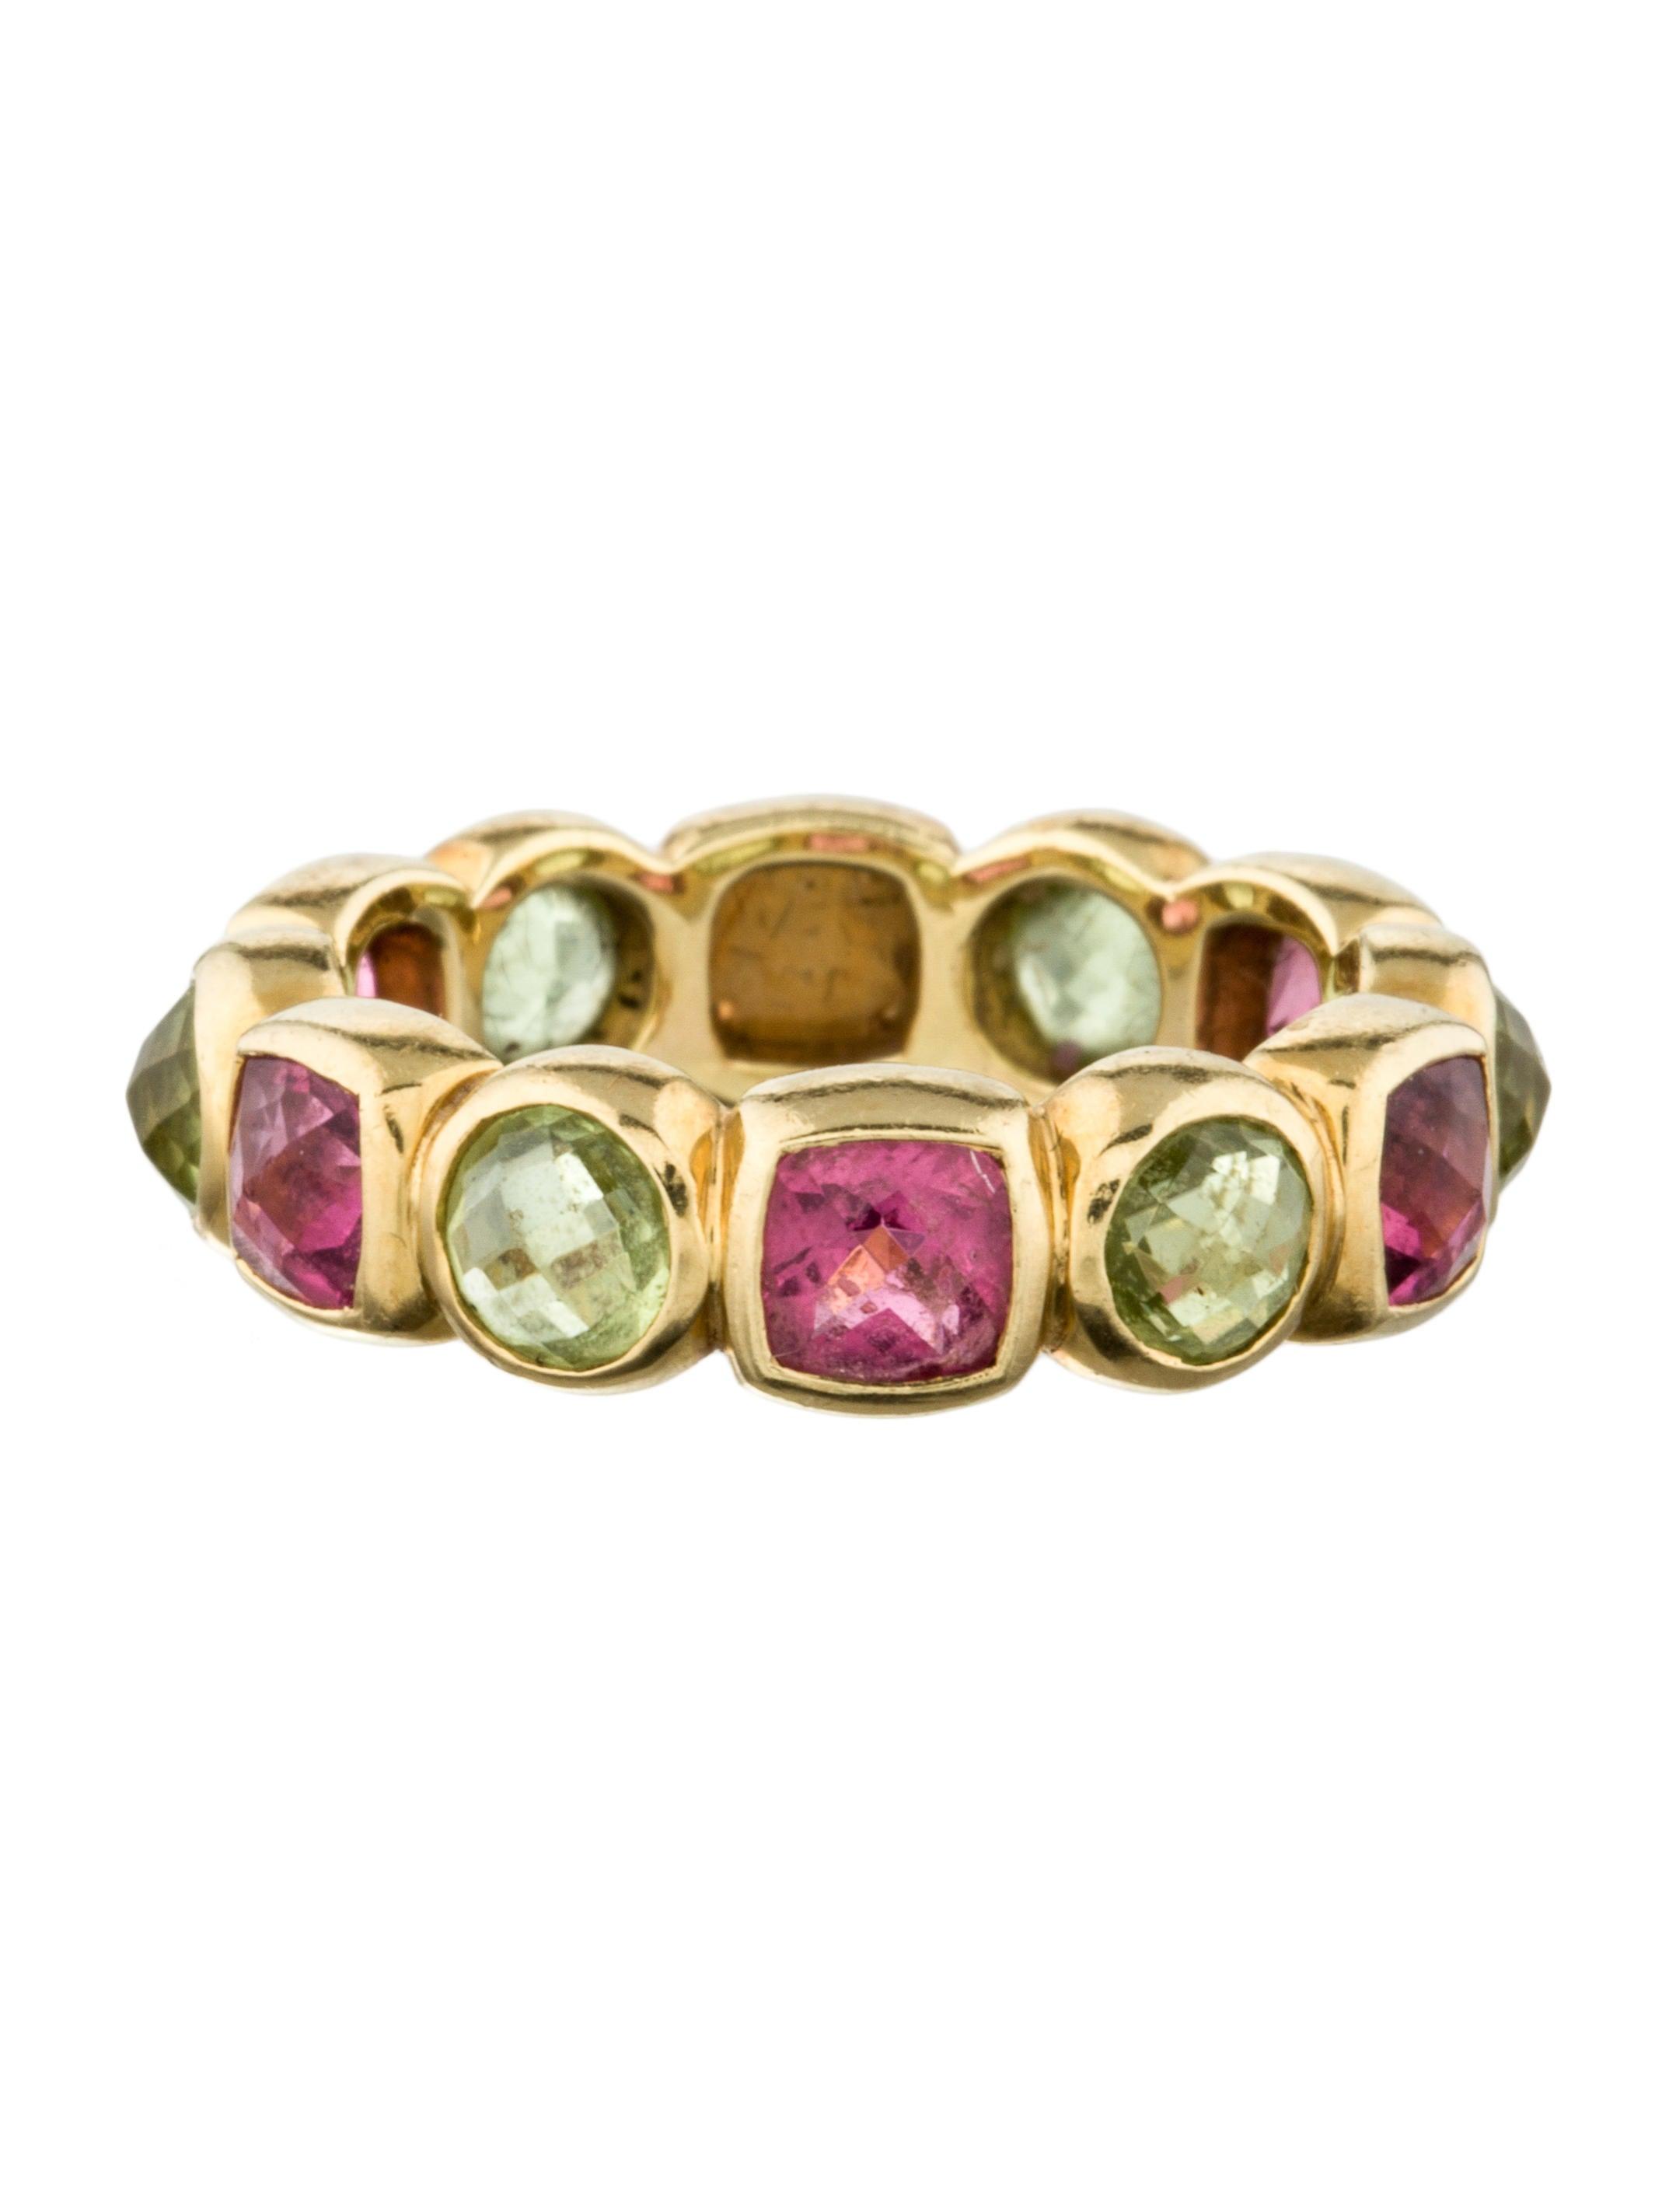 David yurman chiclet ring rings dvy29117 the realreal for David yurman inspired jewelry rings